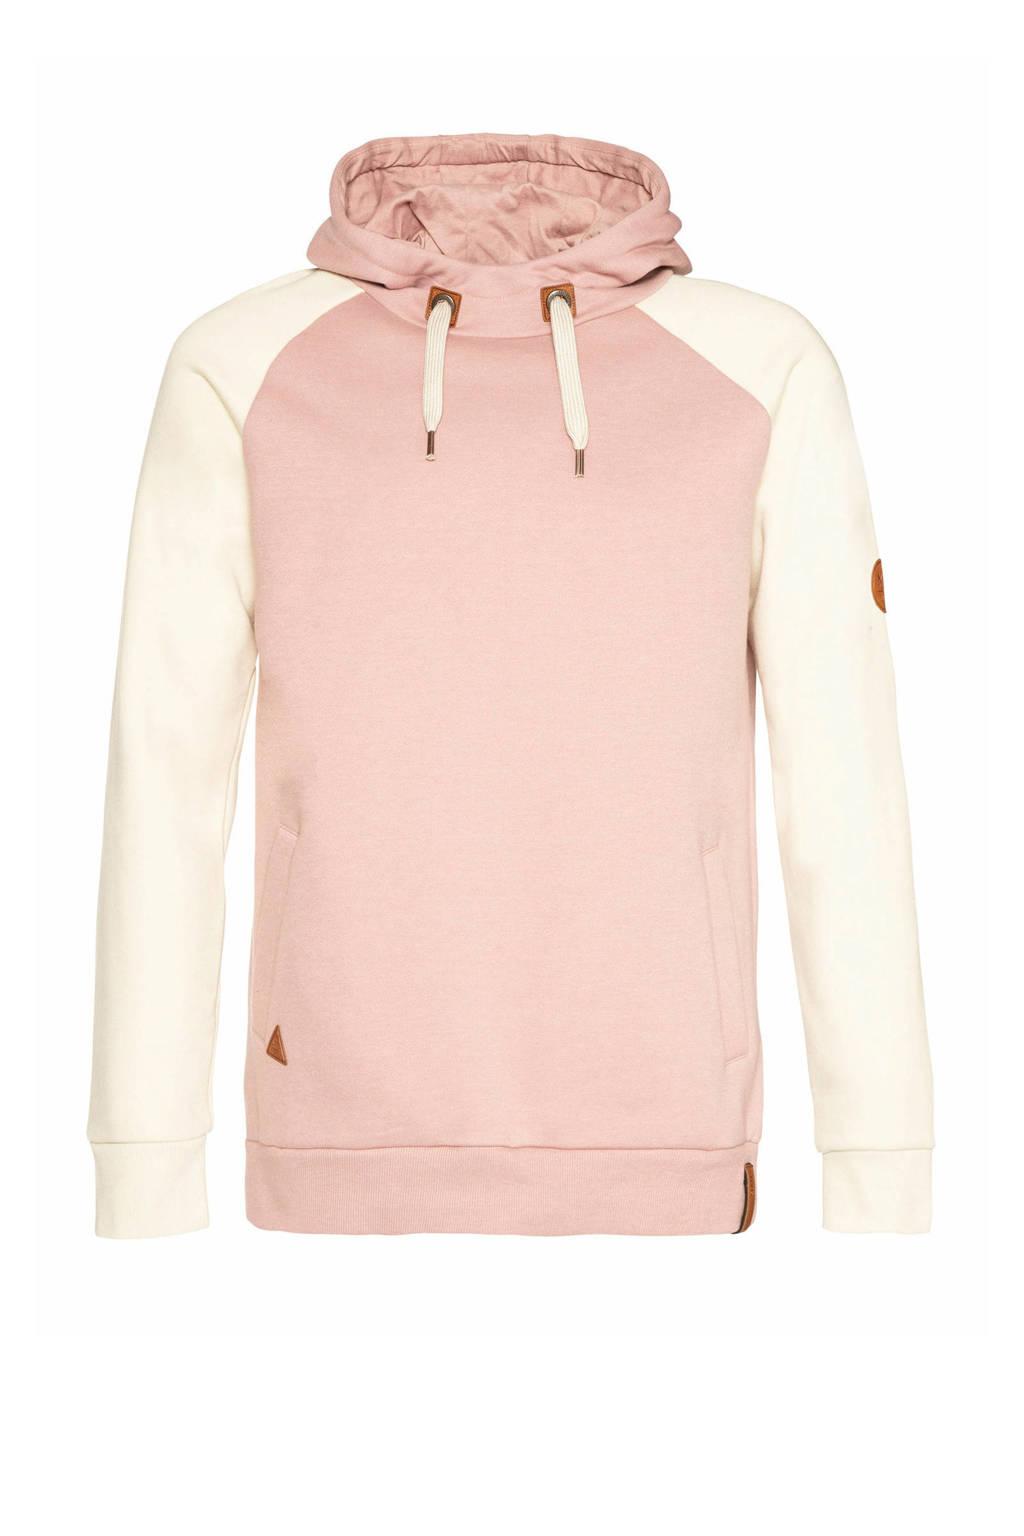 NXG by Protest hoodie Maluku roze/wit, Roze/wit